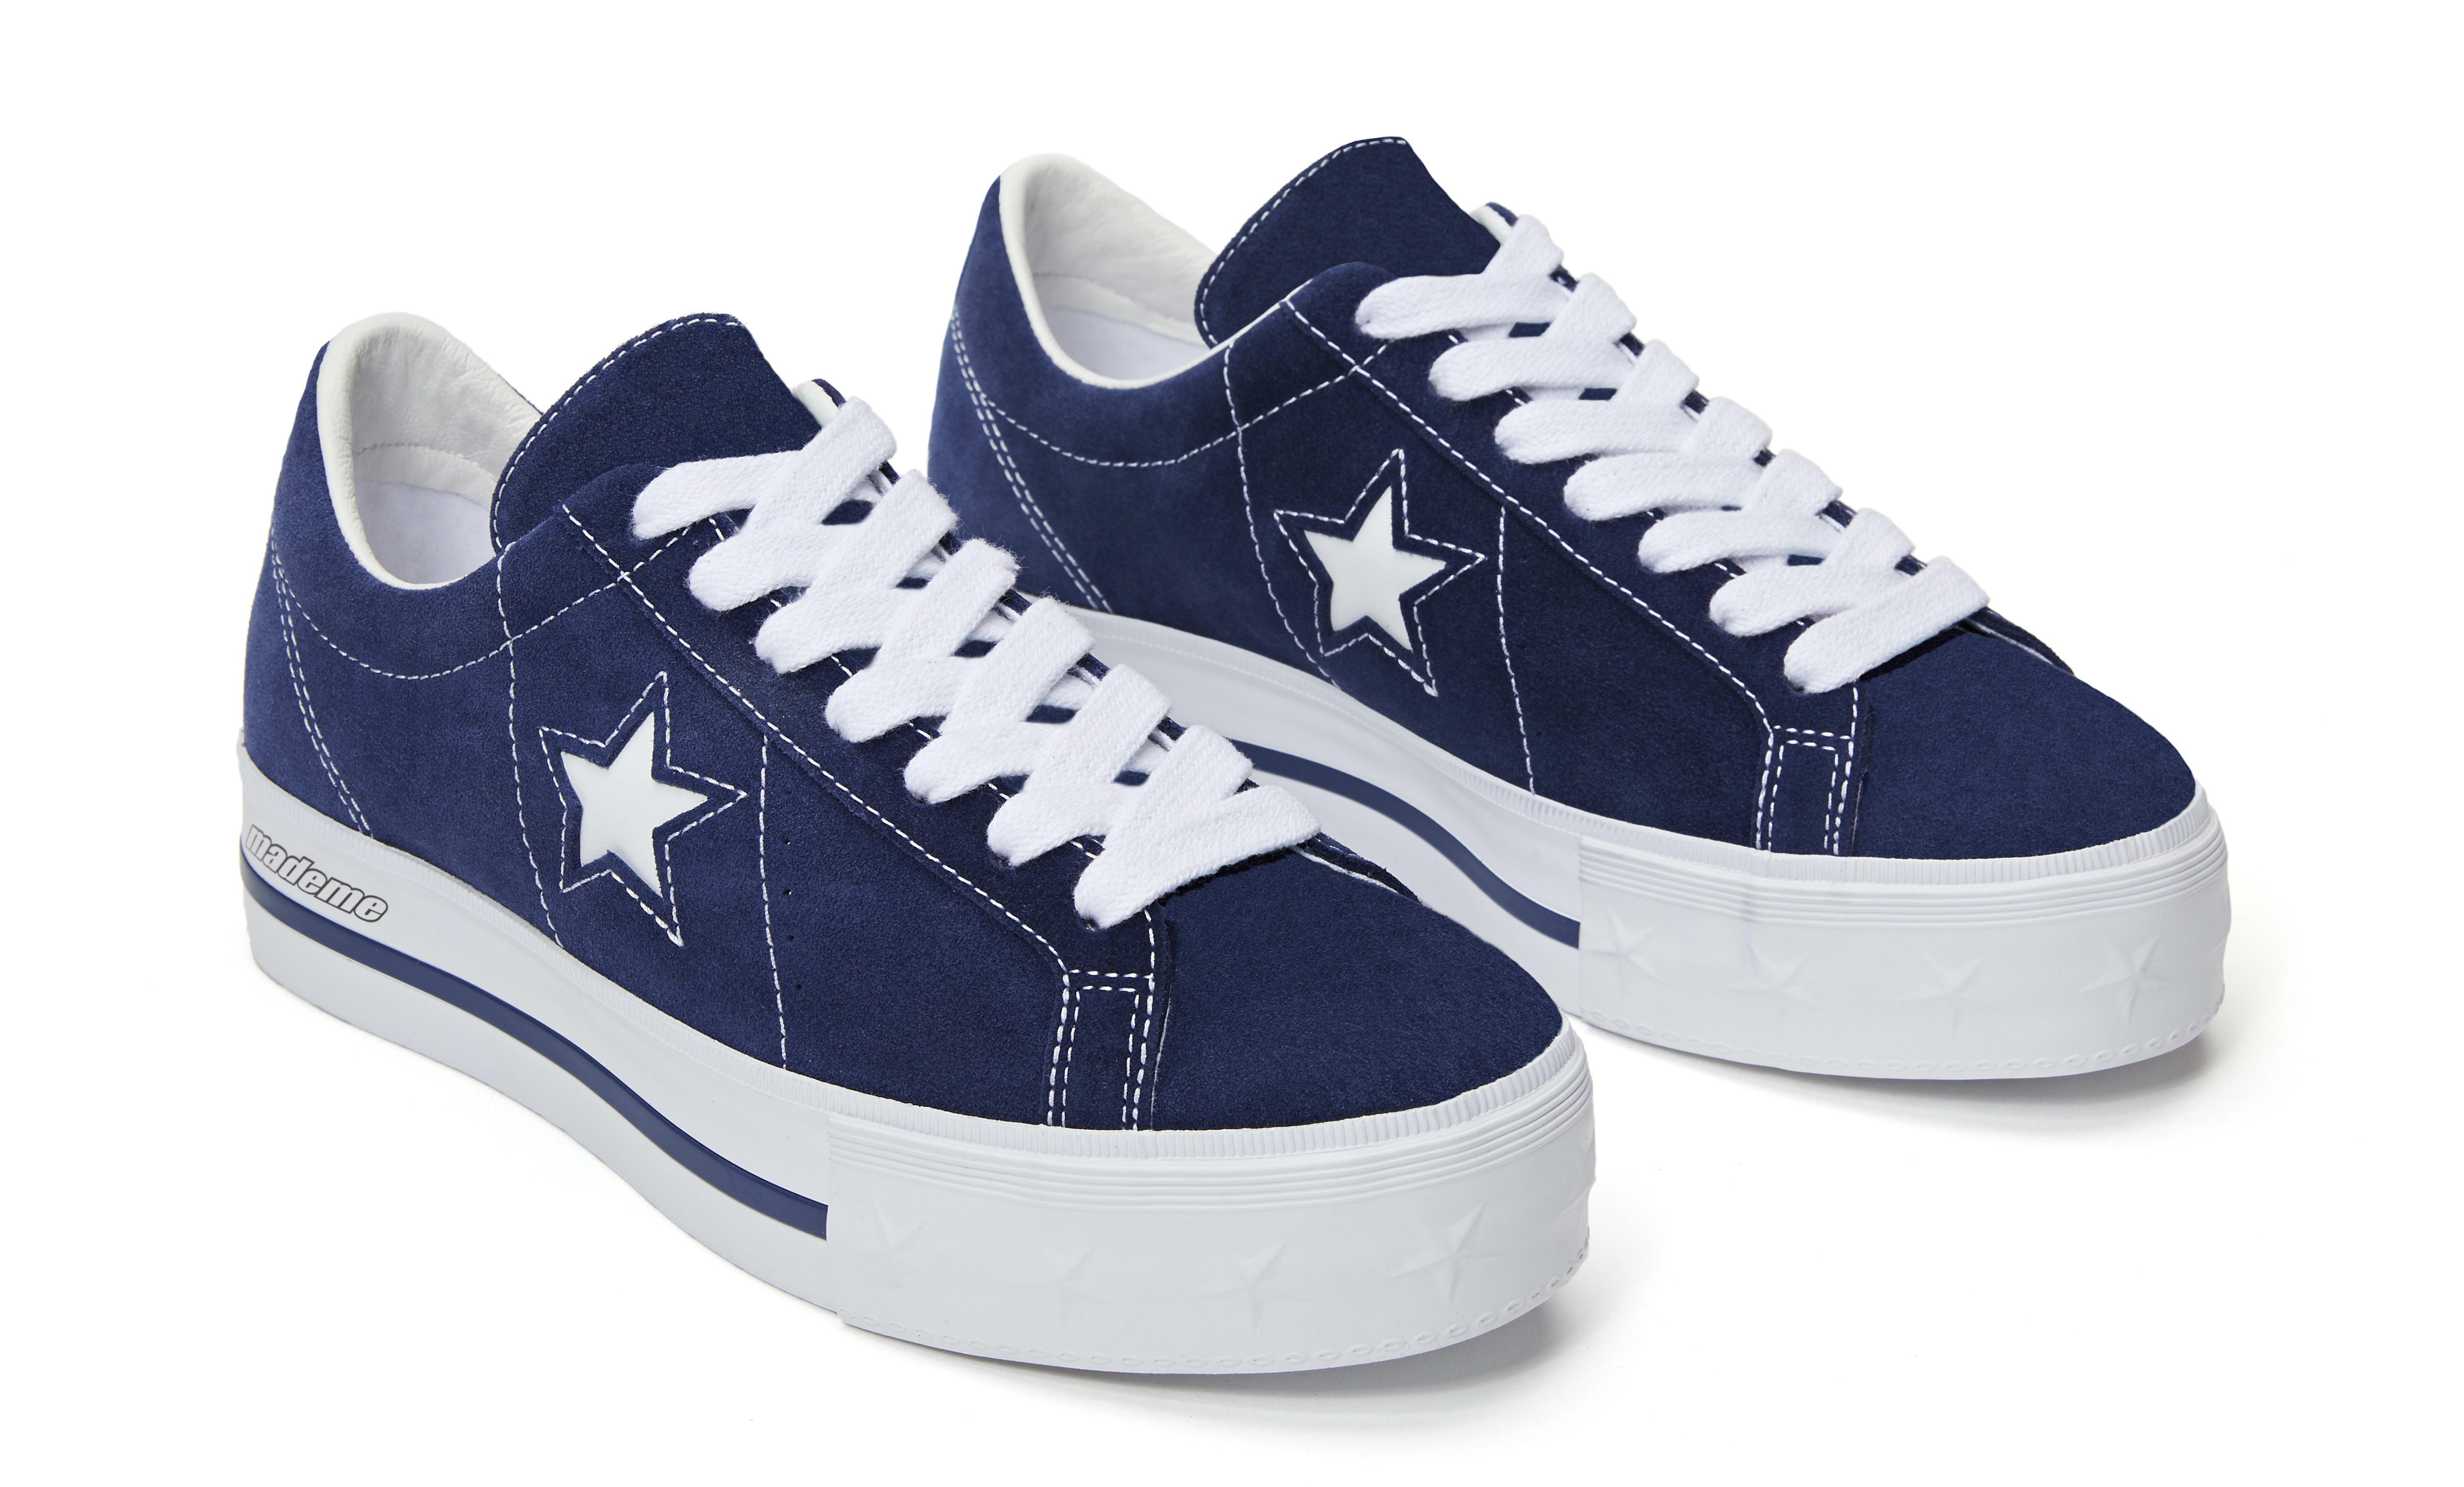 Mademe x Converse One Star 'Medieval Blue' (Pair)